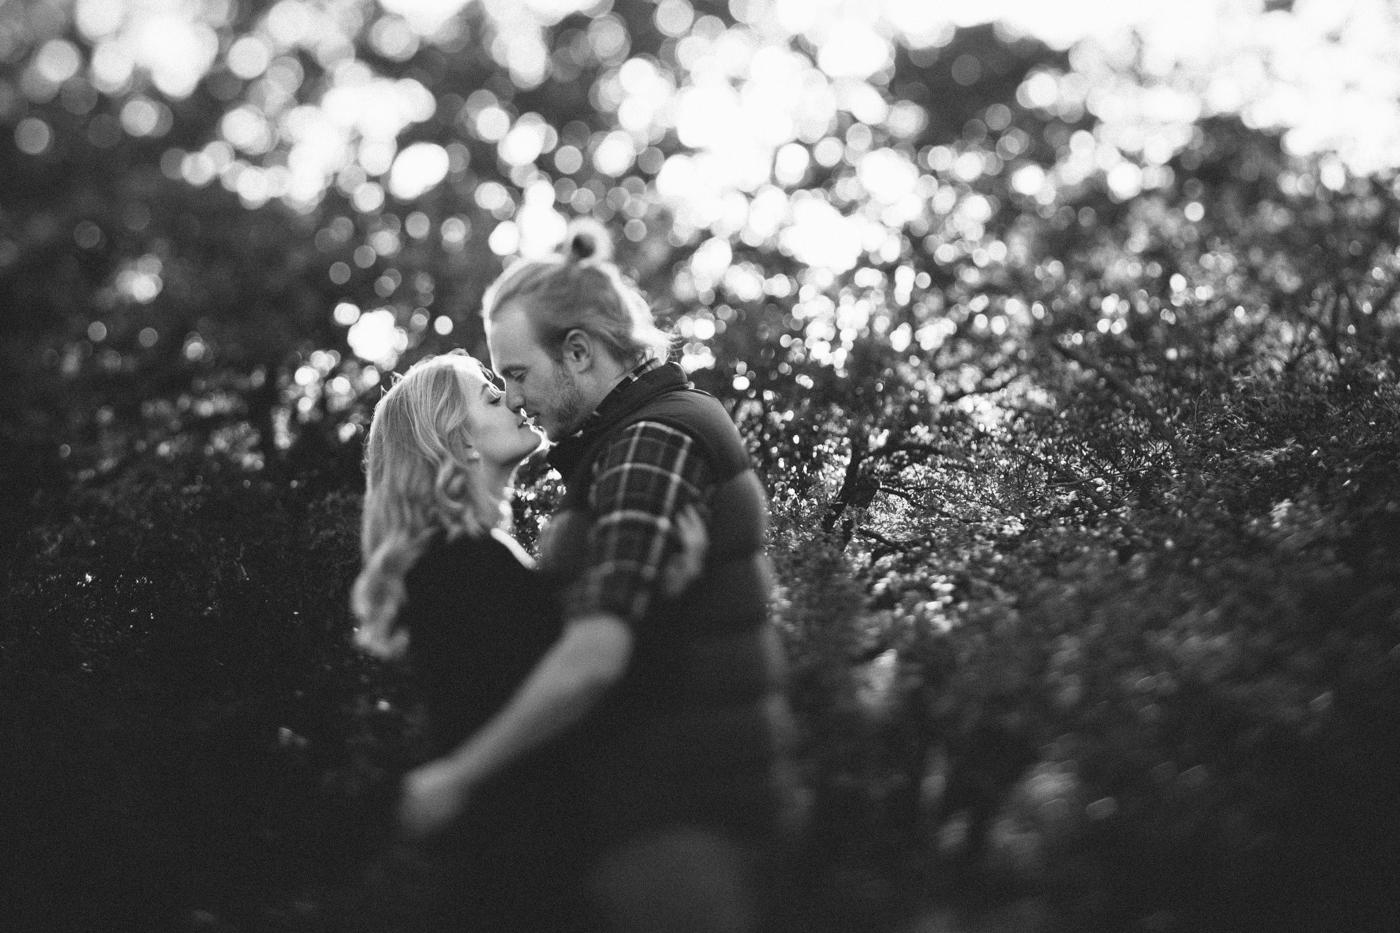 Sioux_Falls_Des_Moines_Engagement_Wedding_Photographer_20.jpg